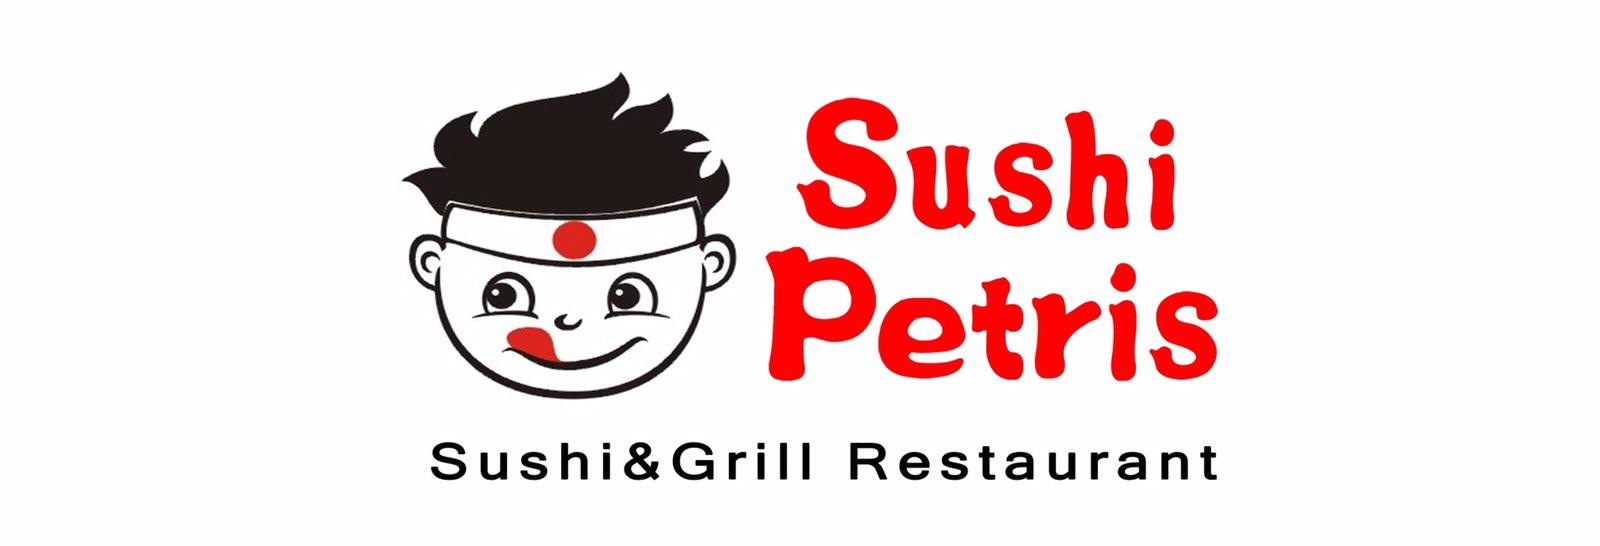 Sushi Petris Sushi & Grill Restaurant